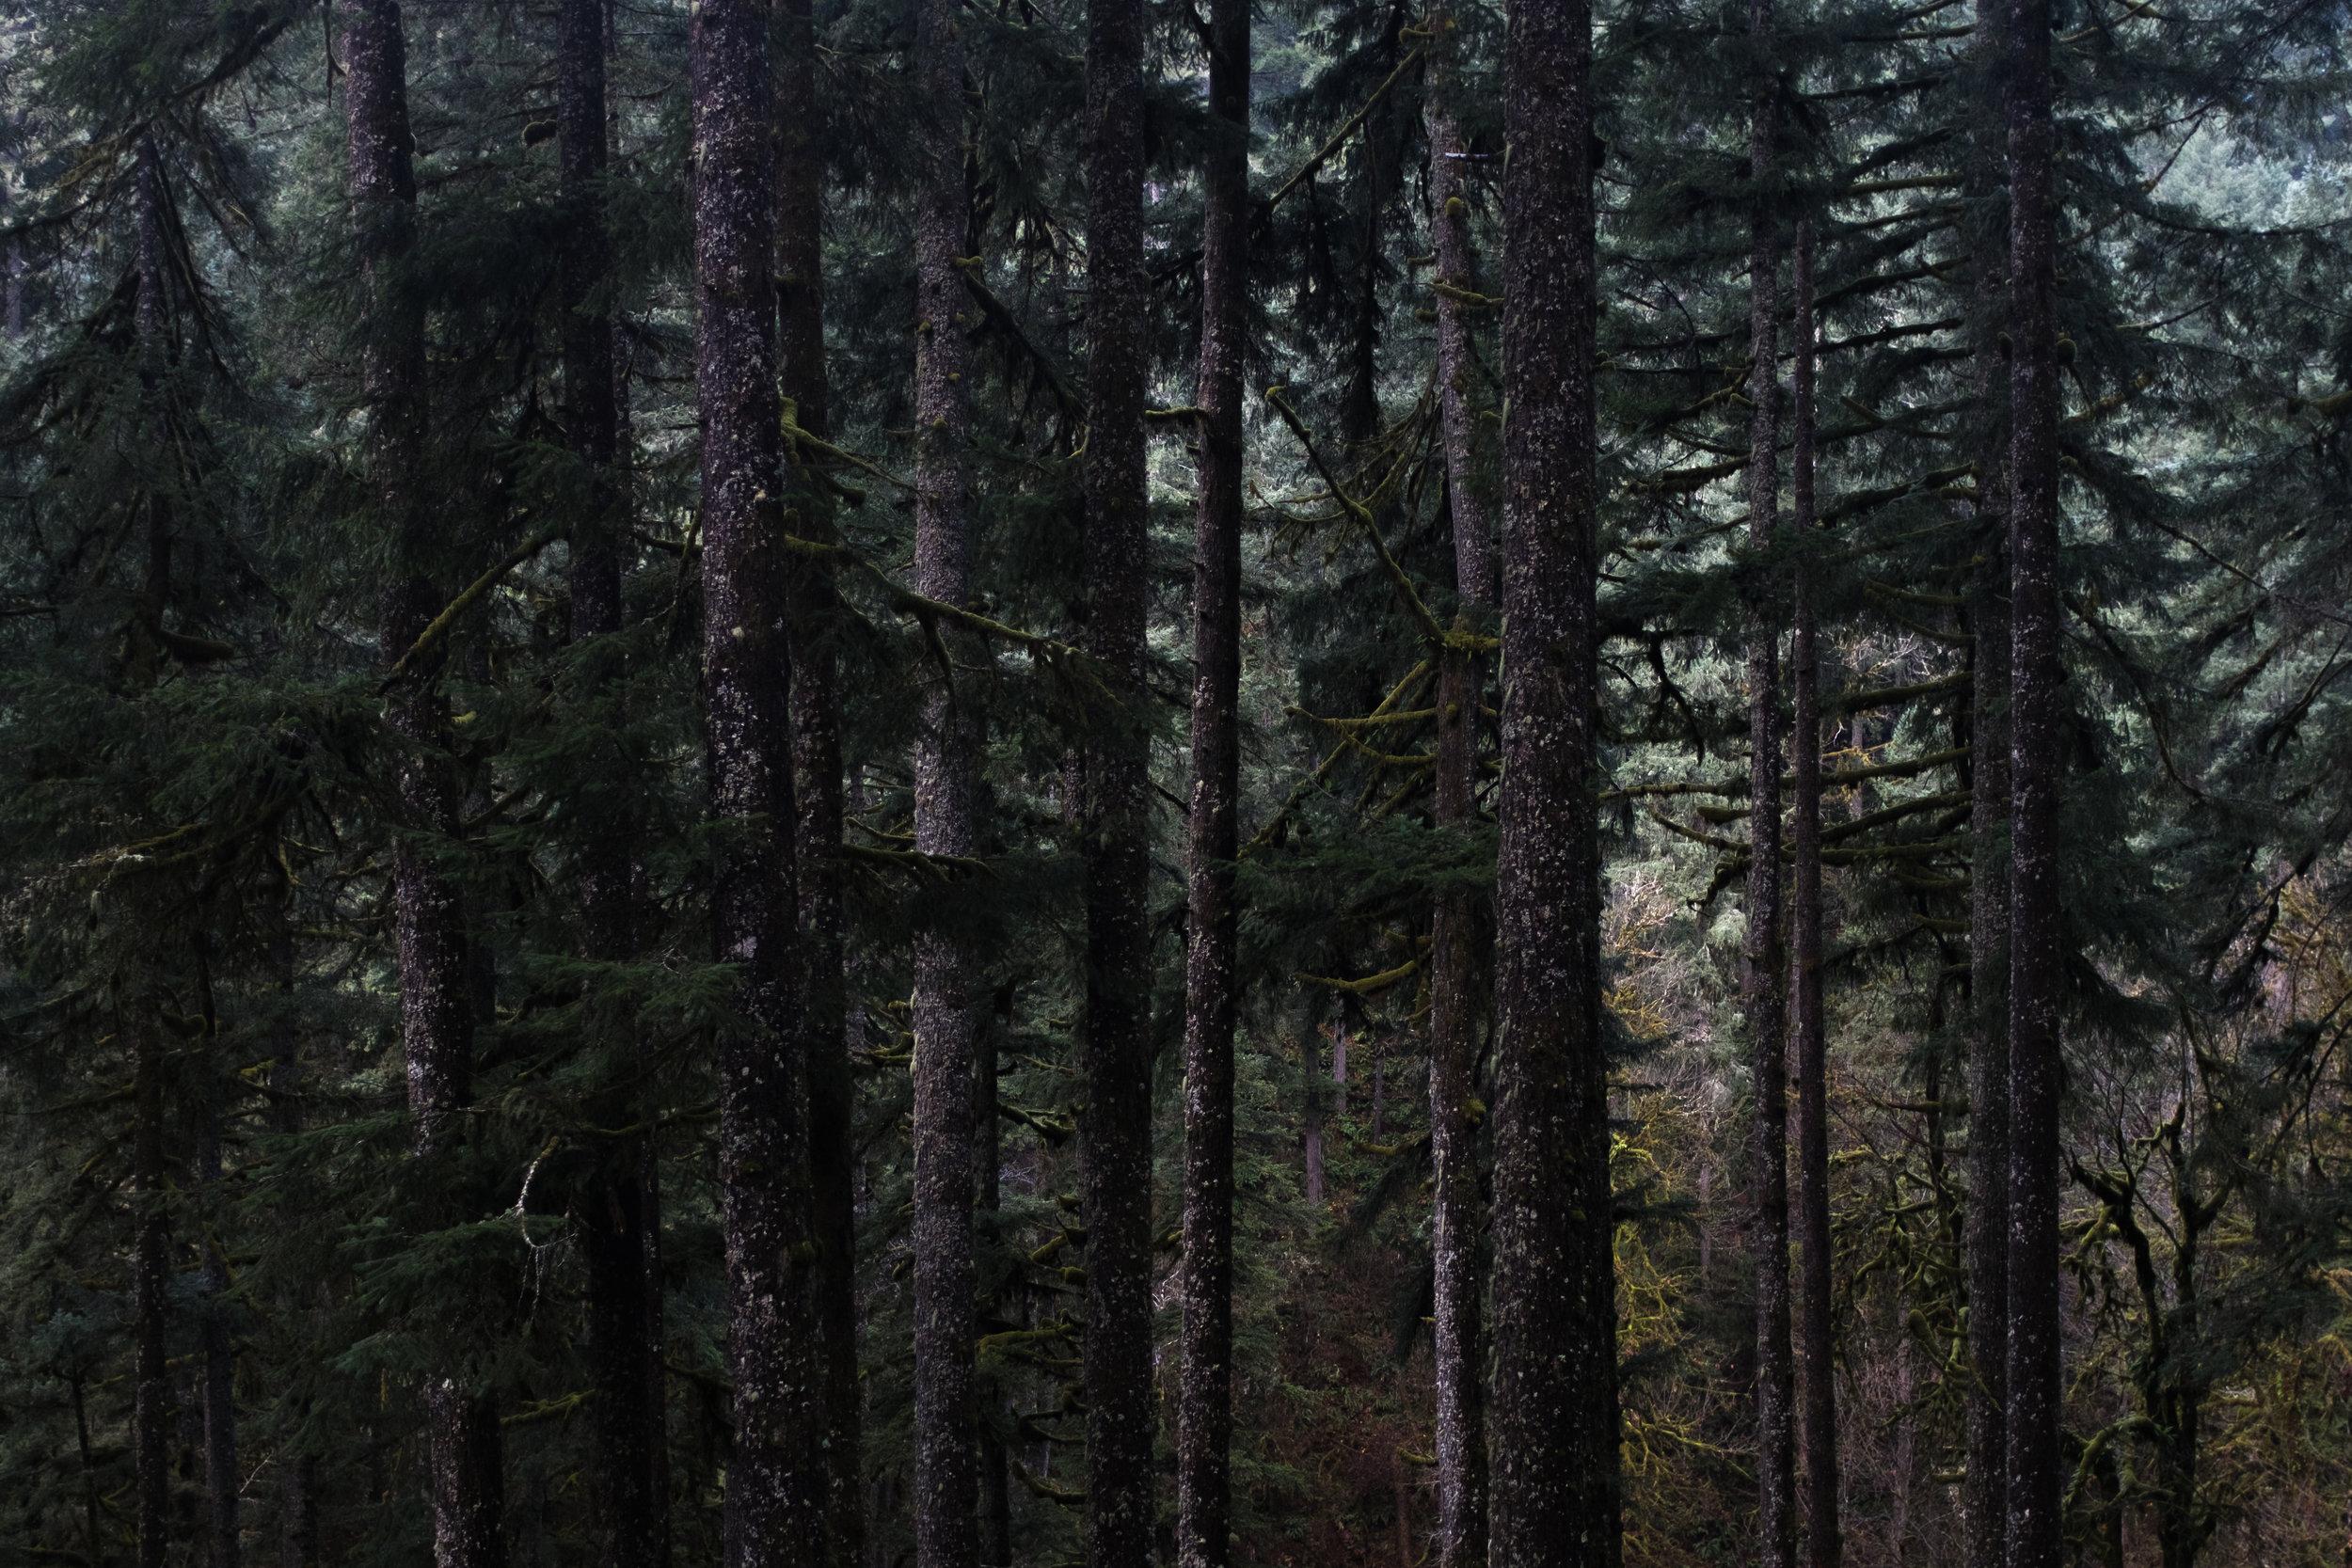 OREGON - Silver Falls State Park ///Portland Japanese Garden